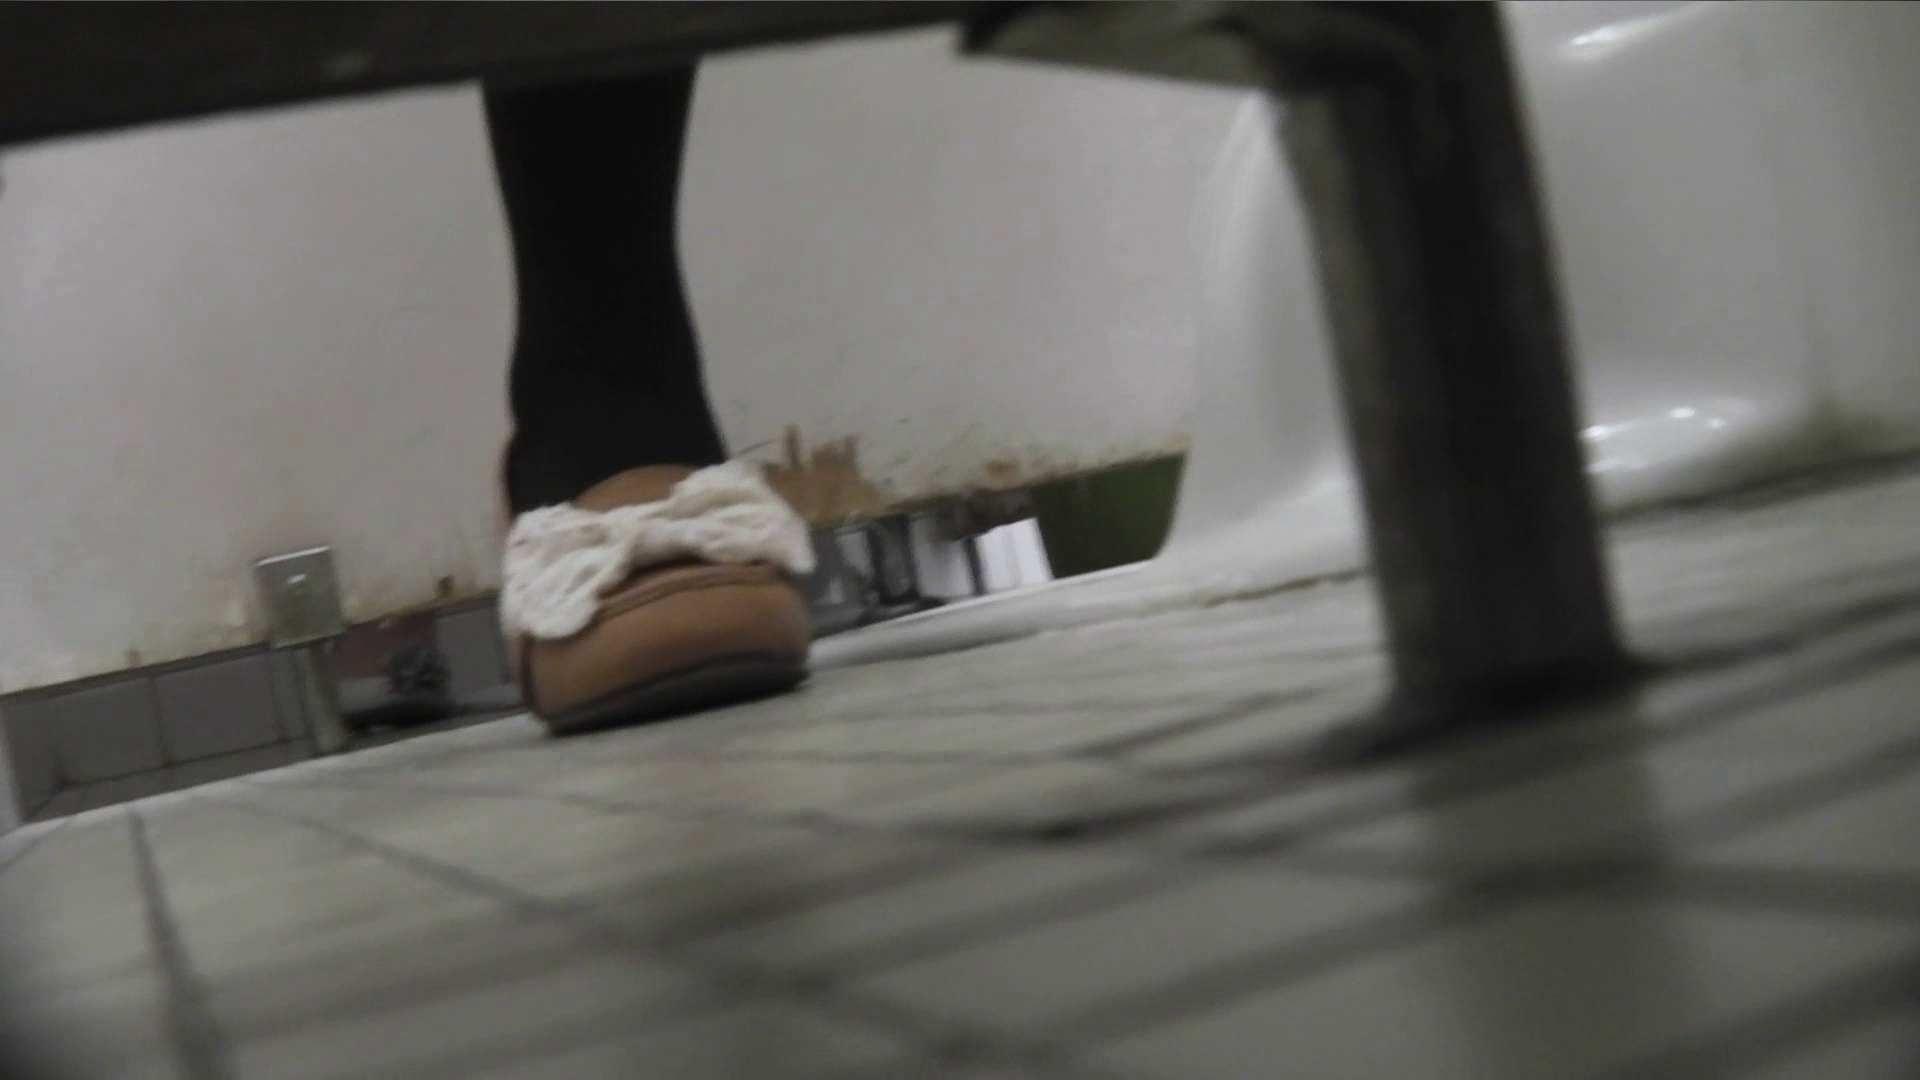 vol.06 命がけ潜伏洗面所! 茶髪タン、ハァハァ 前編 プライベート | 洗面所  107連発 69